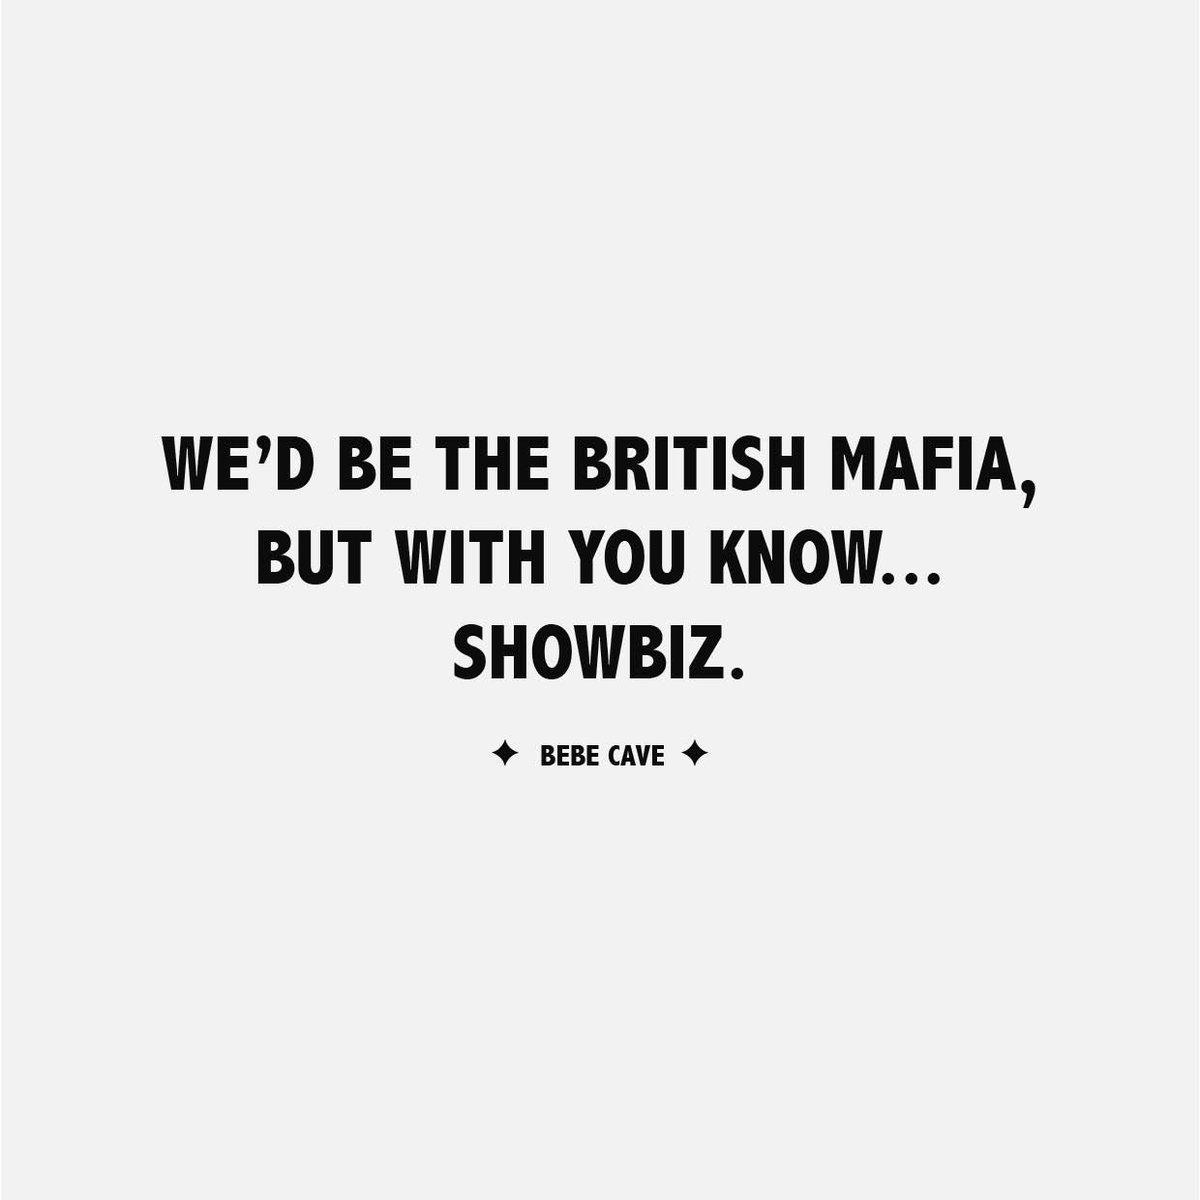 We'd be the British Mafia... @BebeCave   #bbgissue10